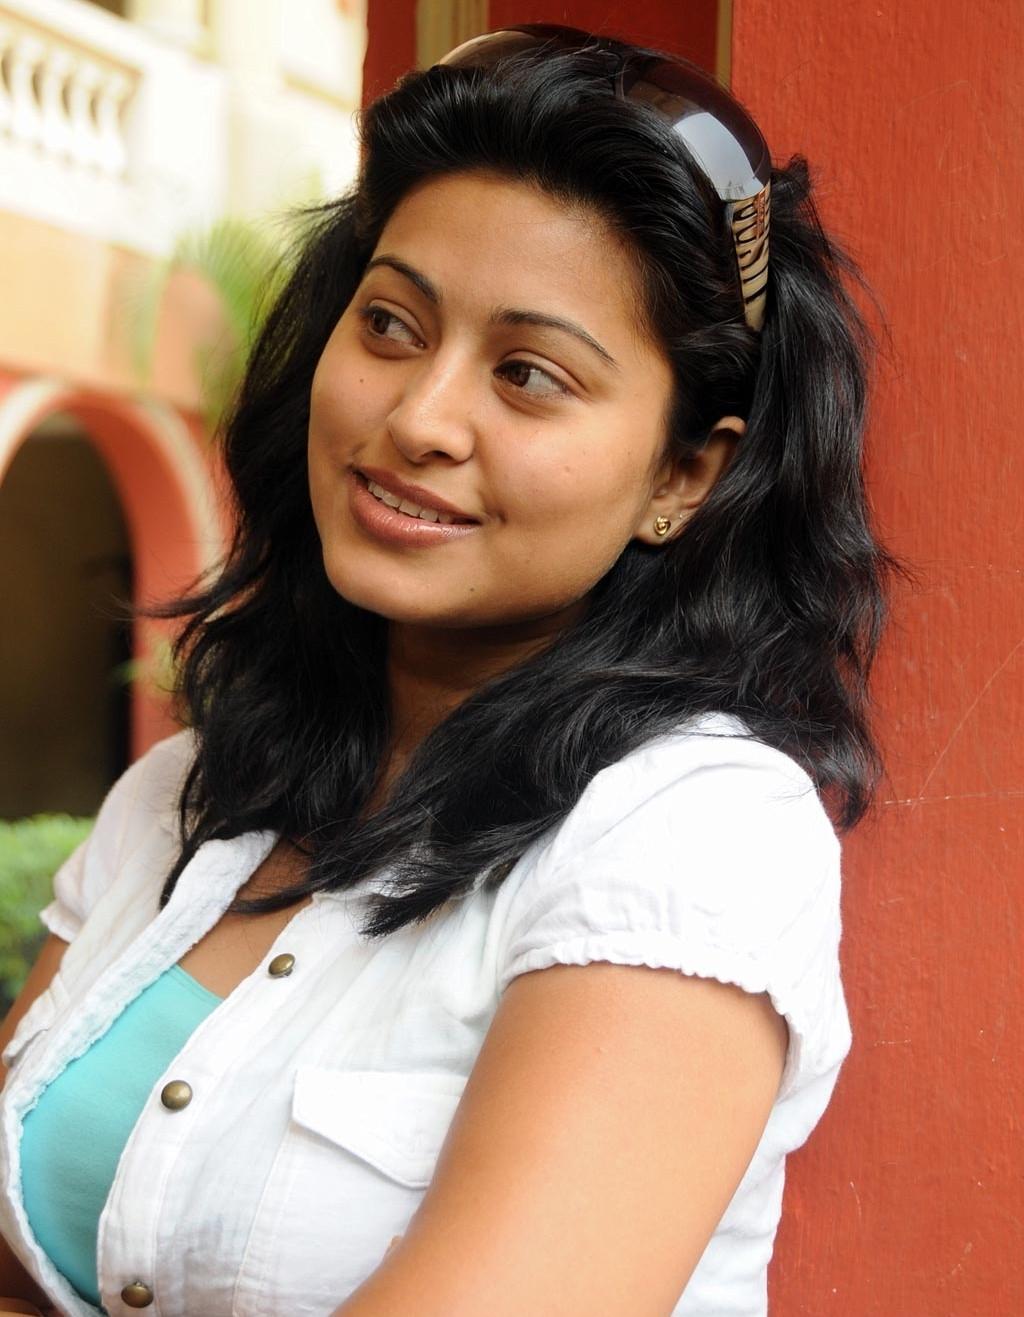 High quality sex pics of tamil actress sneha, man girls naked